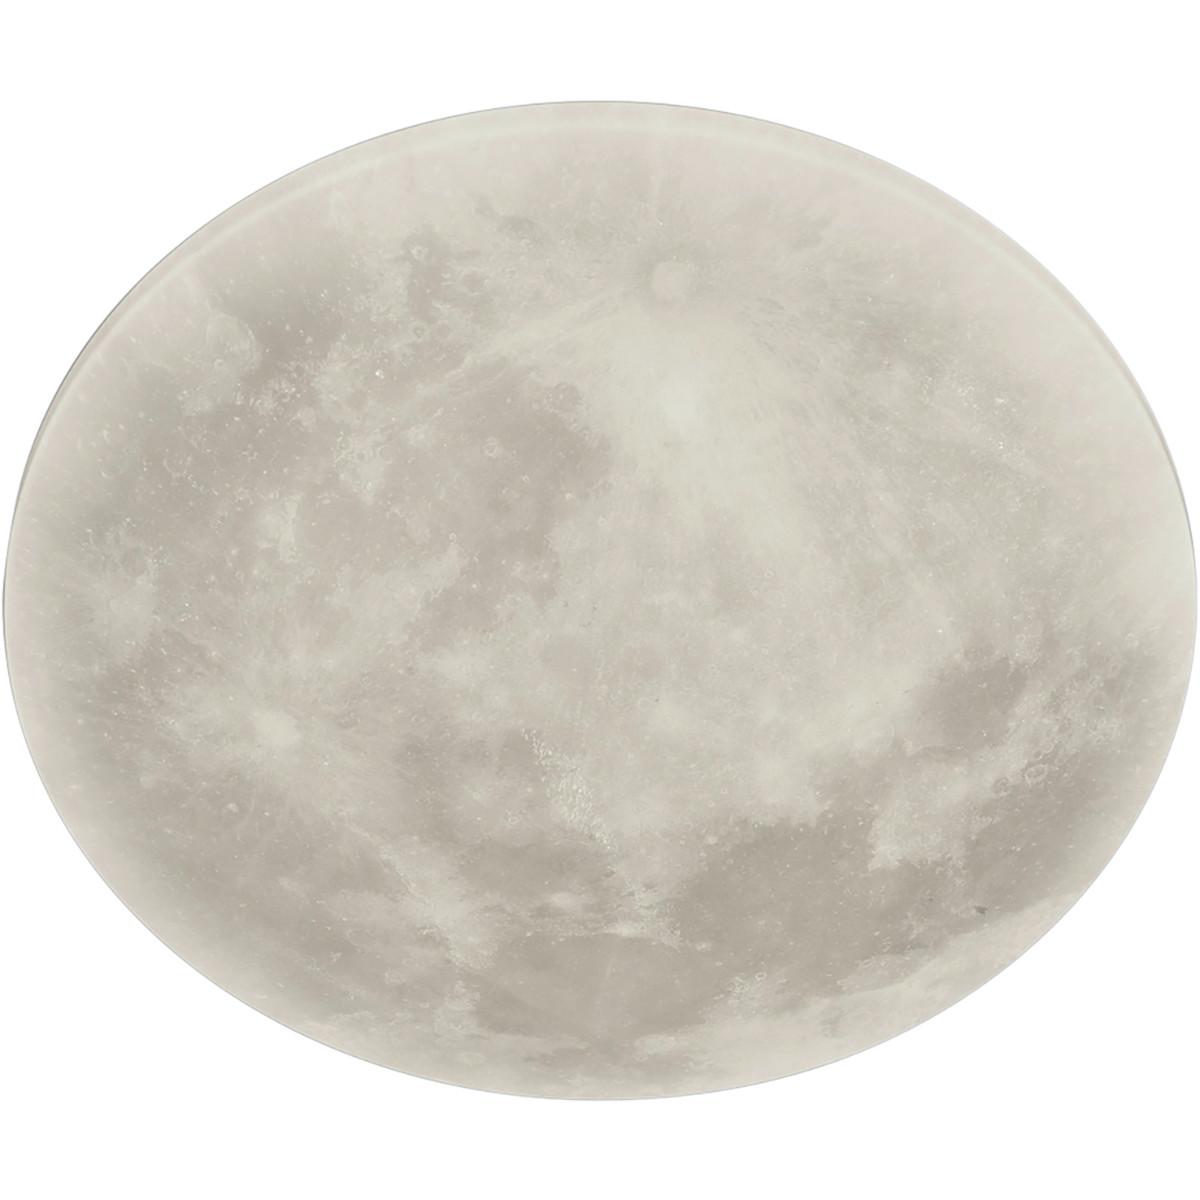 LED Plafondlamp - Trion Maan - 22W - Warm Wit 3000K - Dimbaar - Afstandsbediening - Rond - Mat Wit